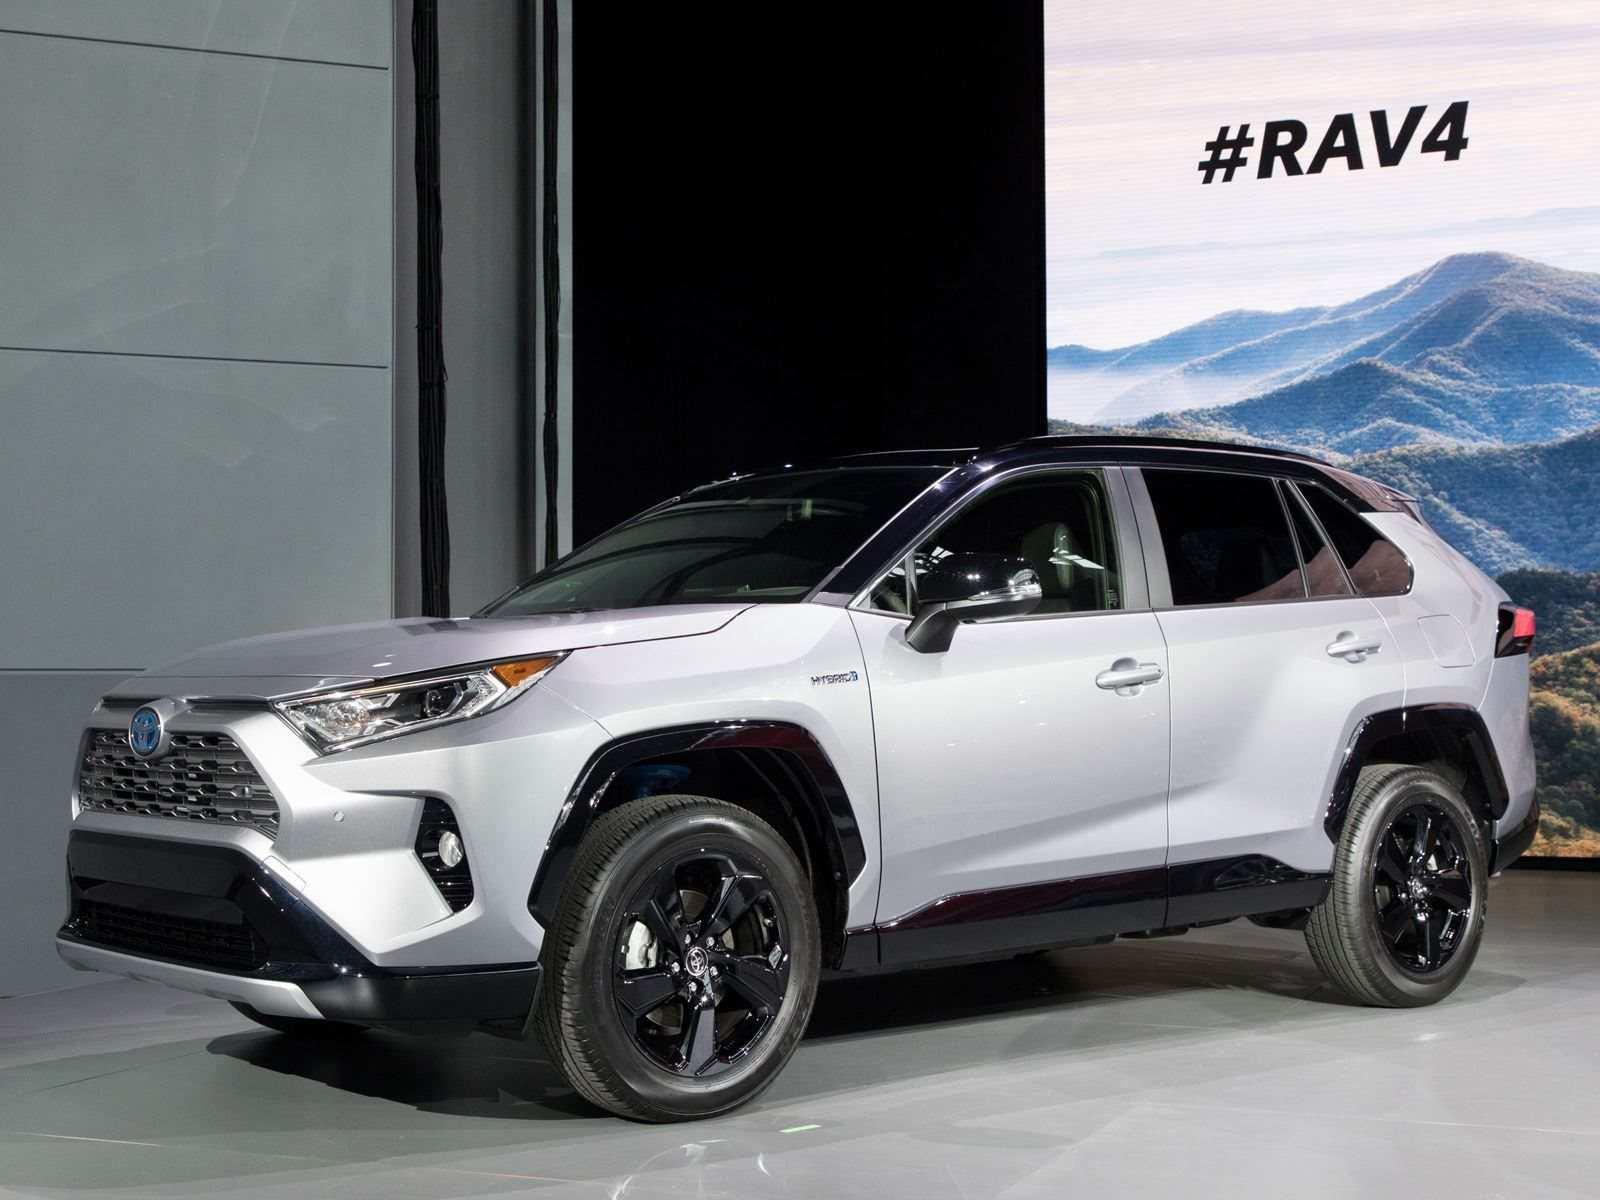 19 Gallery of Best Toyota Rav4 Hybrid 2019 Specs And Review Specs by Best Toyota Rav4 Hybrid 2019 Specs And Review